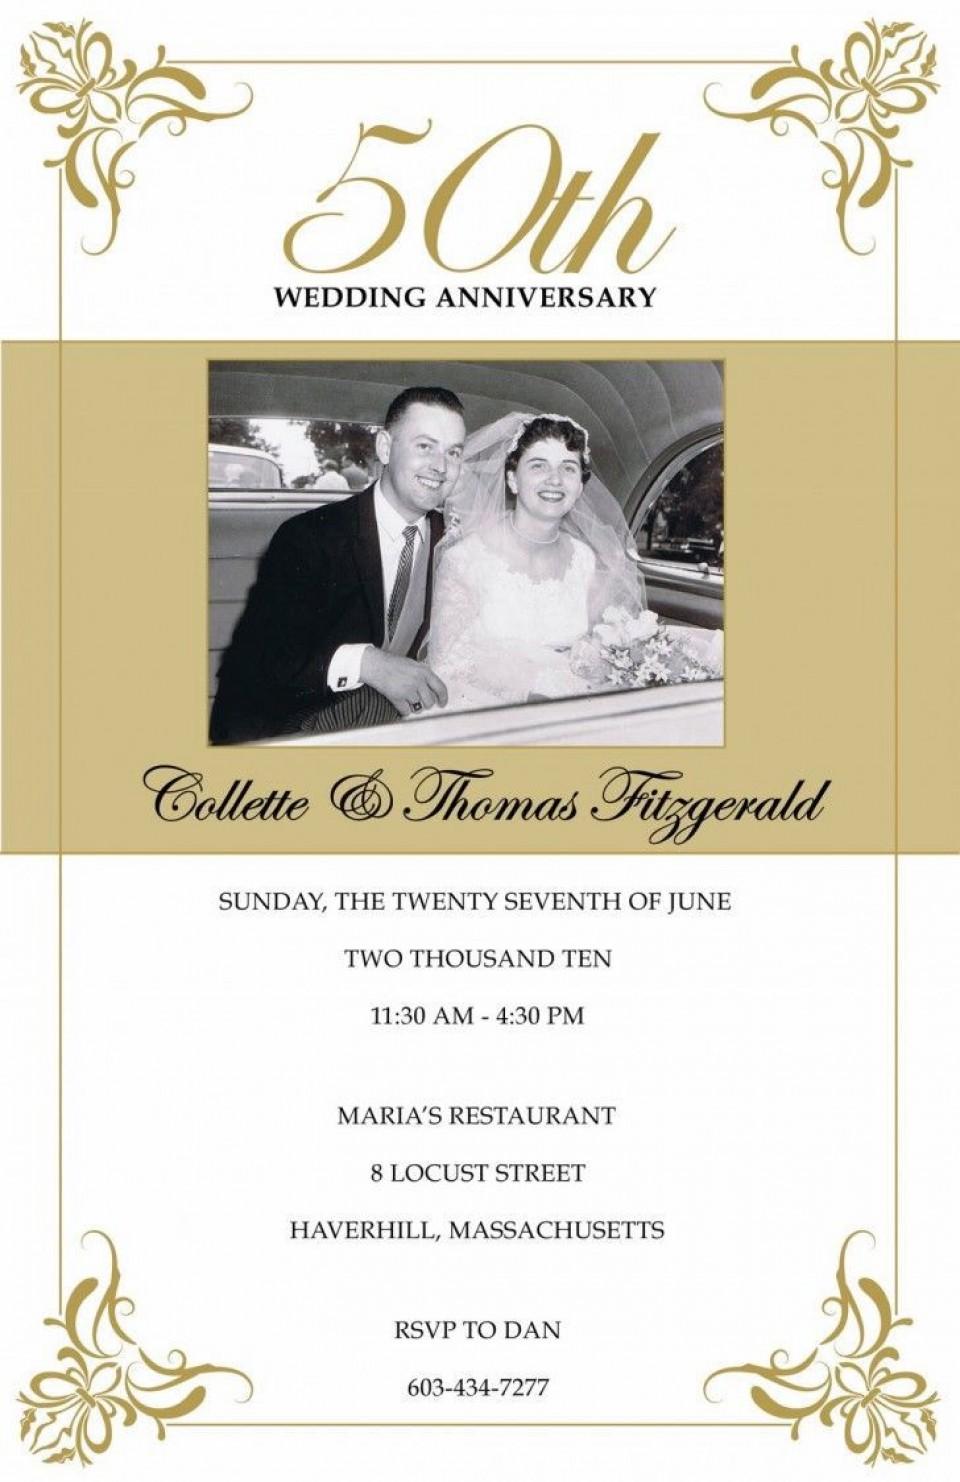 006 Shocking 50th Anniversary Invitation Wording Sample  Wedding 60th In Tamil Birthday960